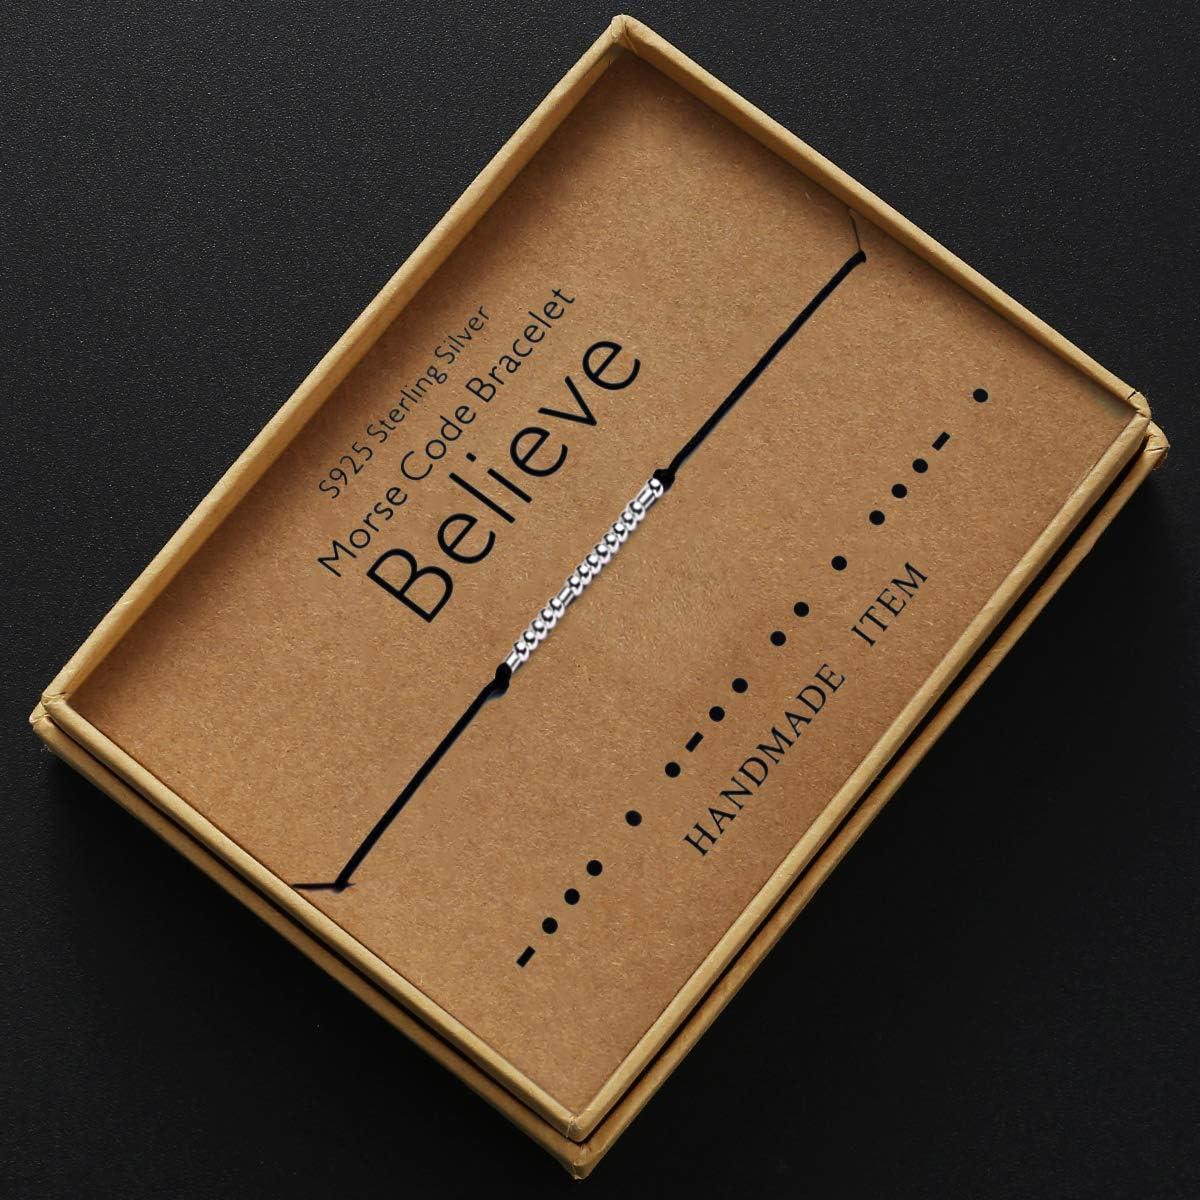 Morse-code Armband Best wishes Bad  Cord Geheime Botschaft Geschenk Armbänder